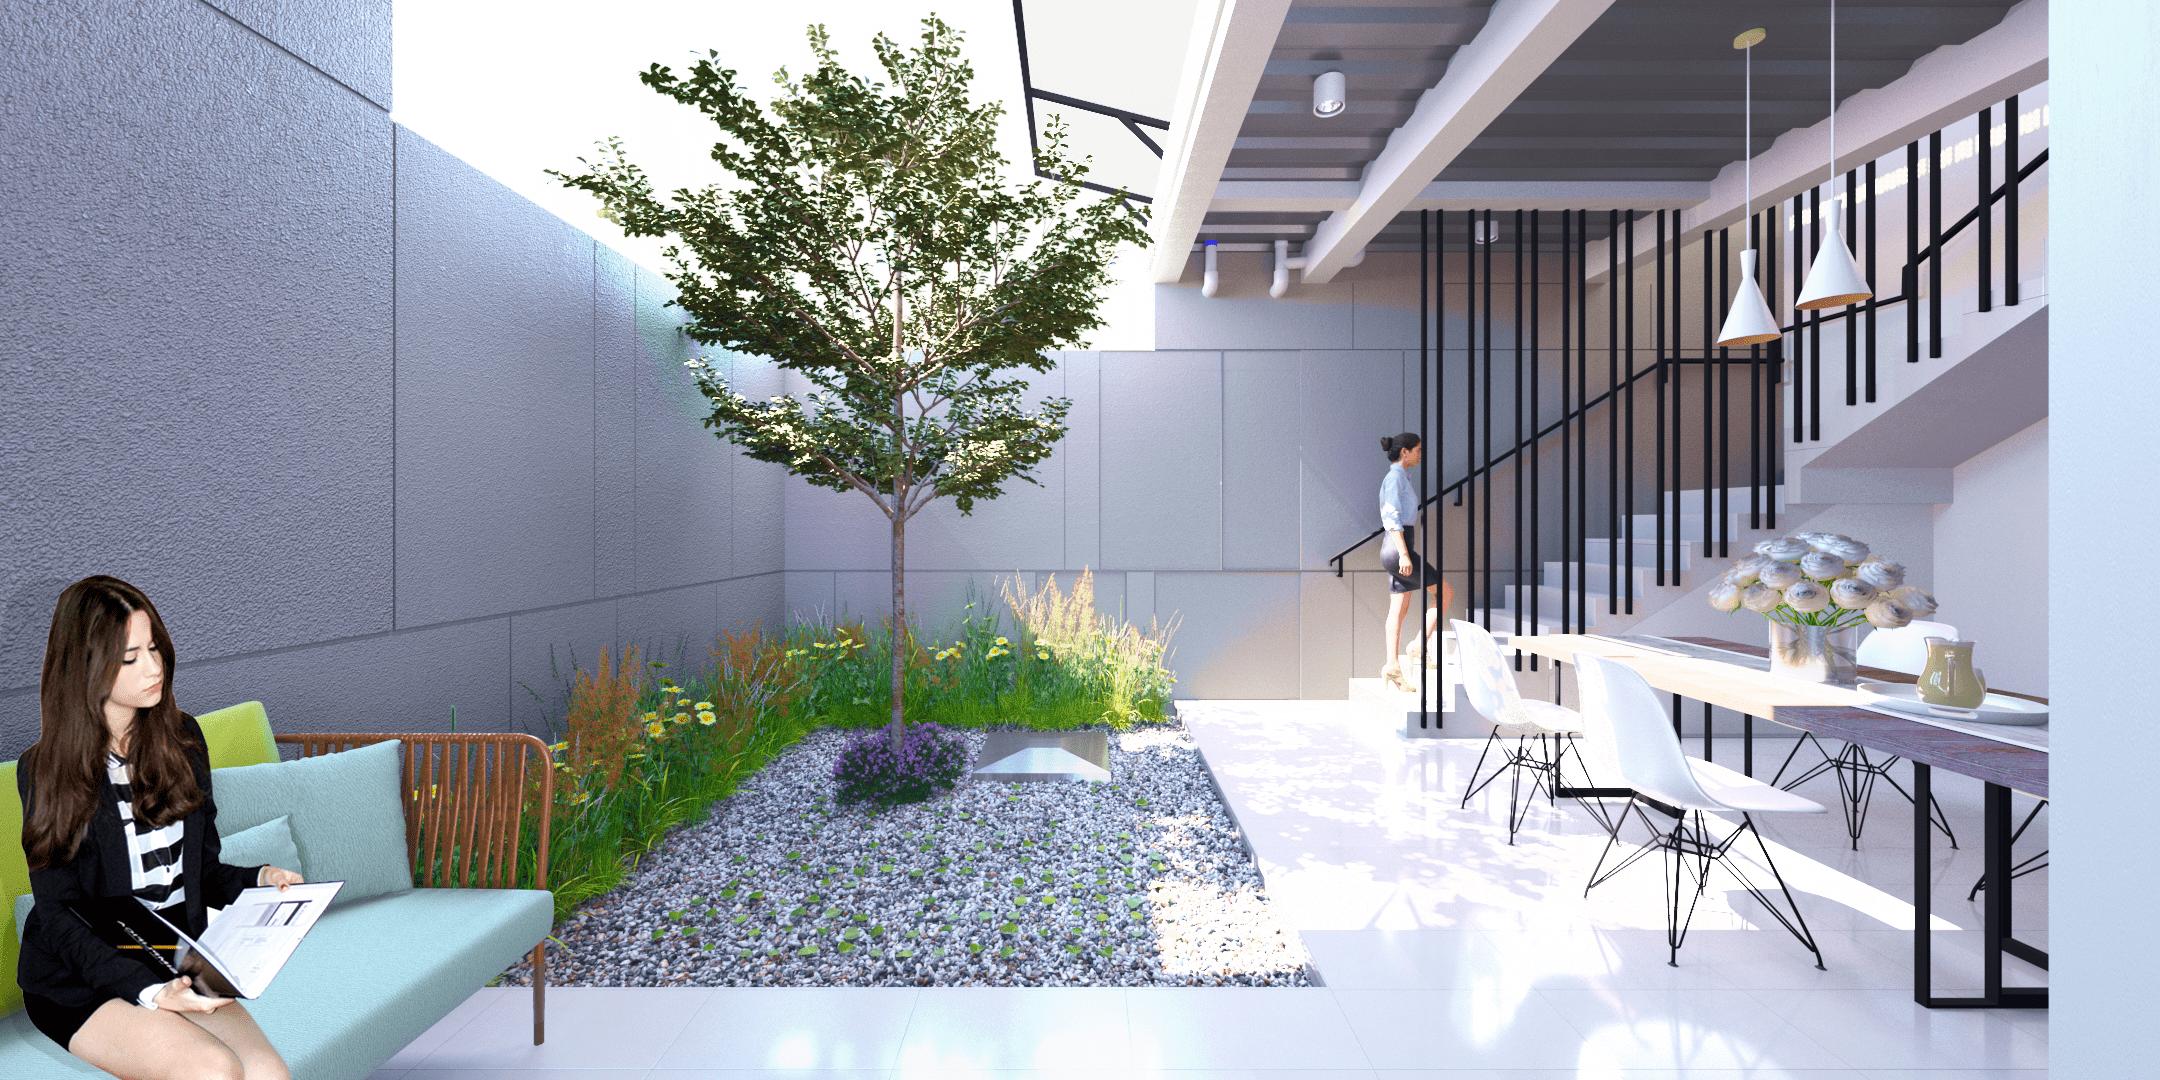 desain-arsitektur-renovasi-ruang-service-area-di-malang-jawa-timur